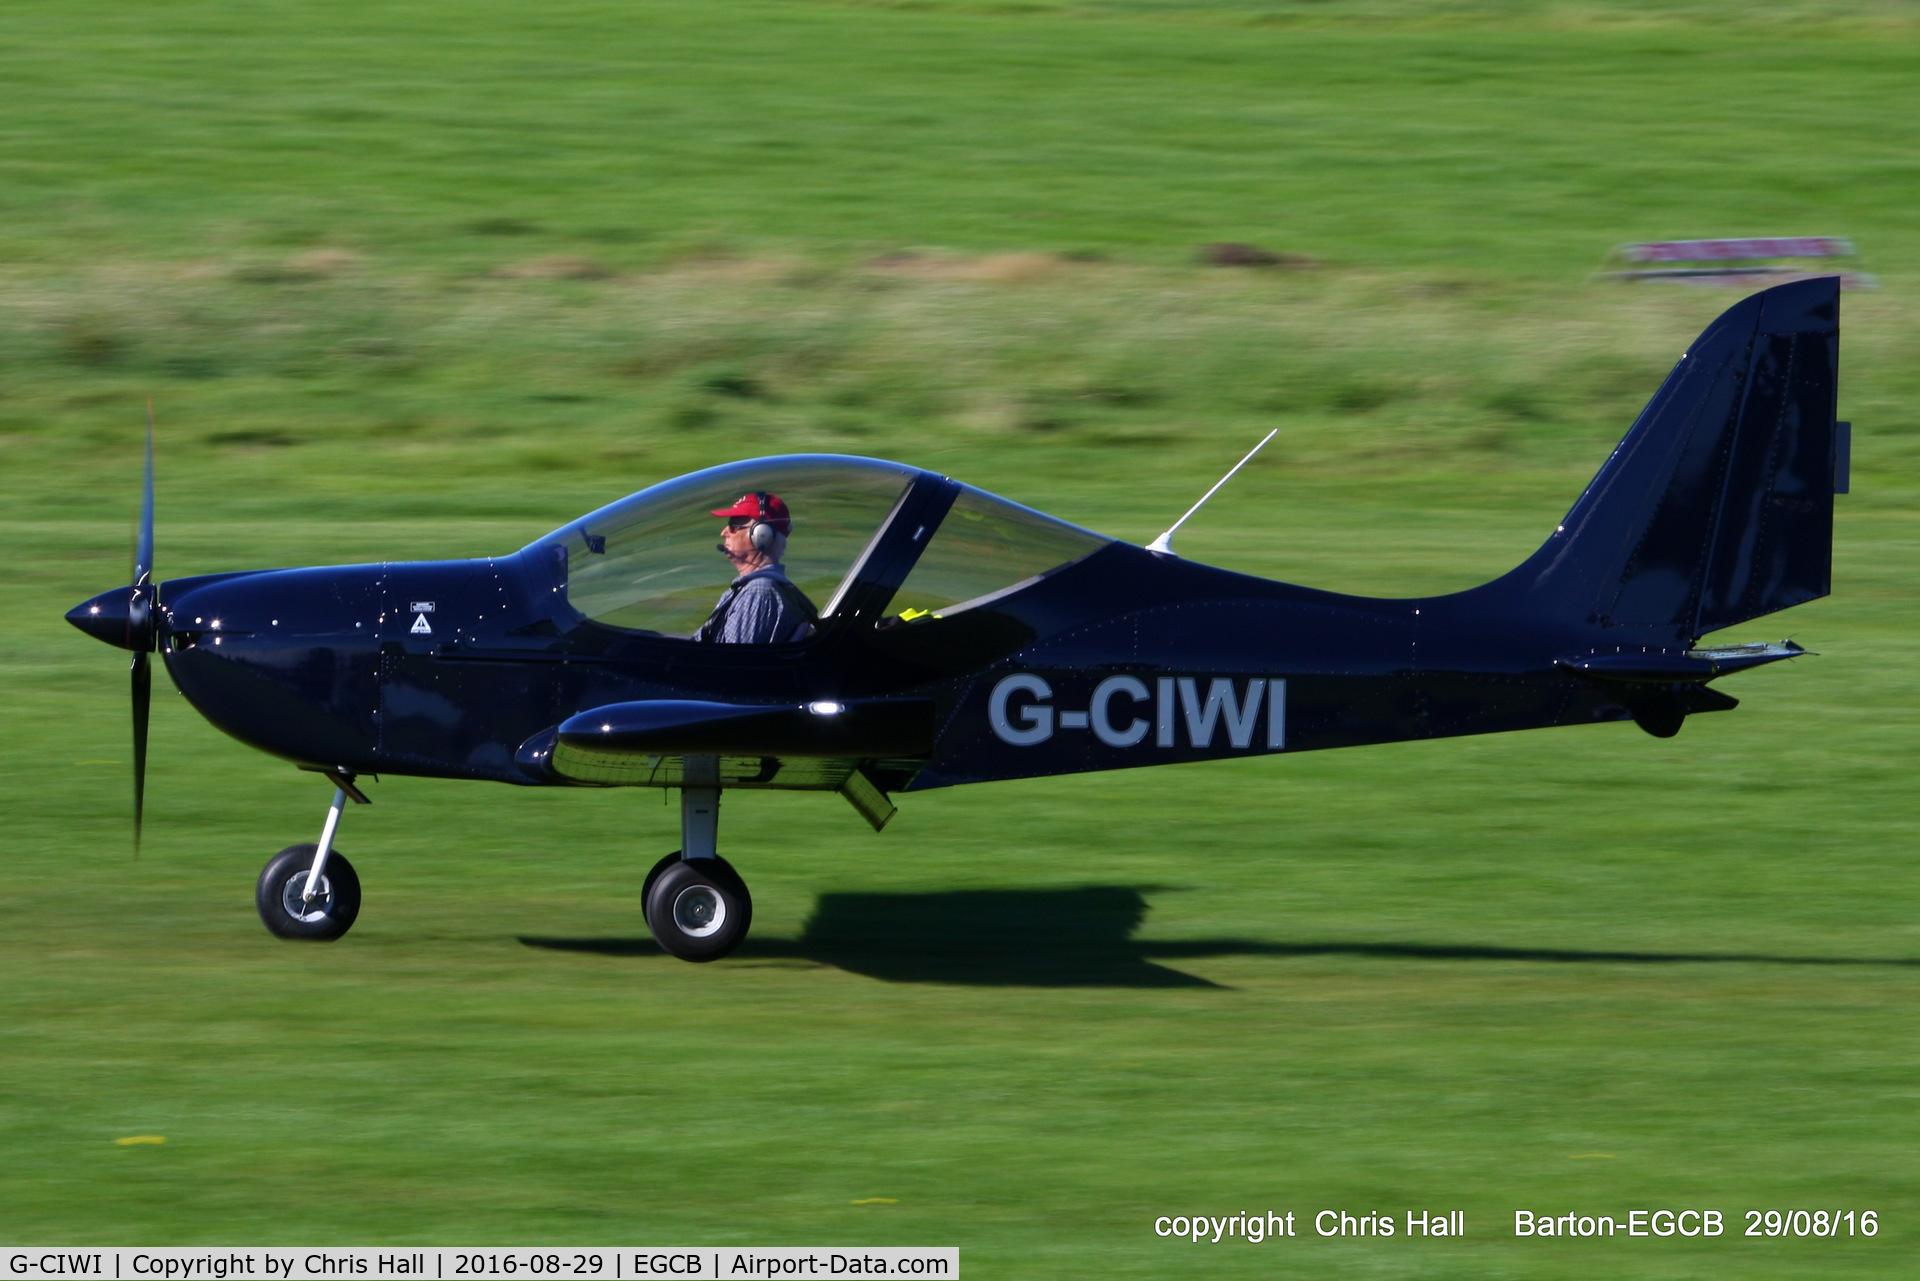 G-CIWI, 2015 Evektor EV-97 Eurostar SL C/N 2015-4227, at Barton